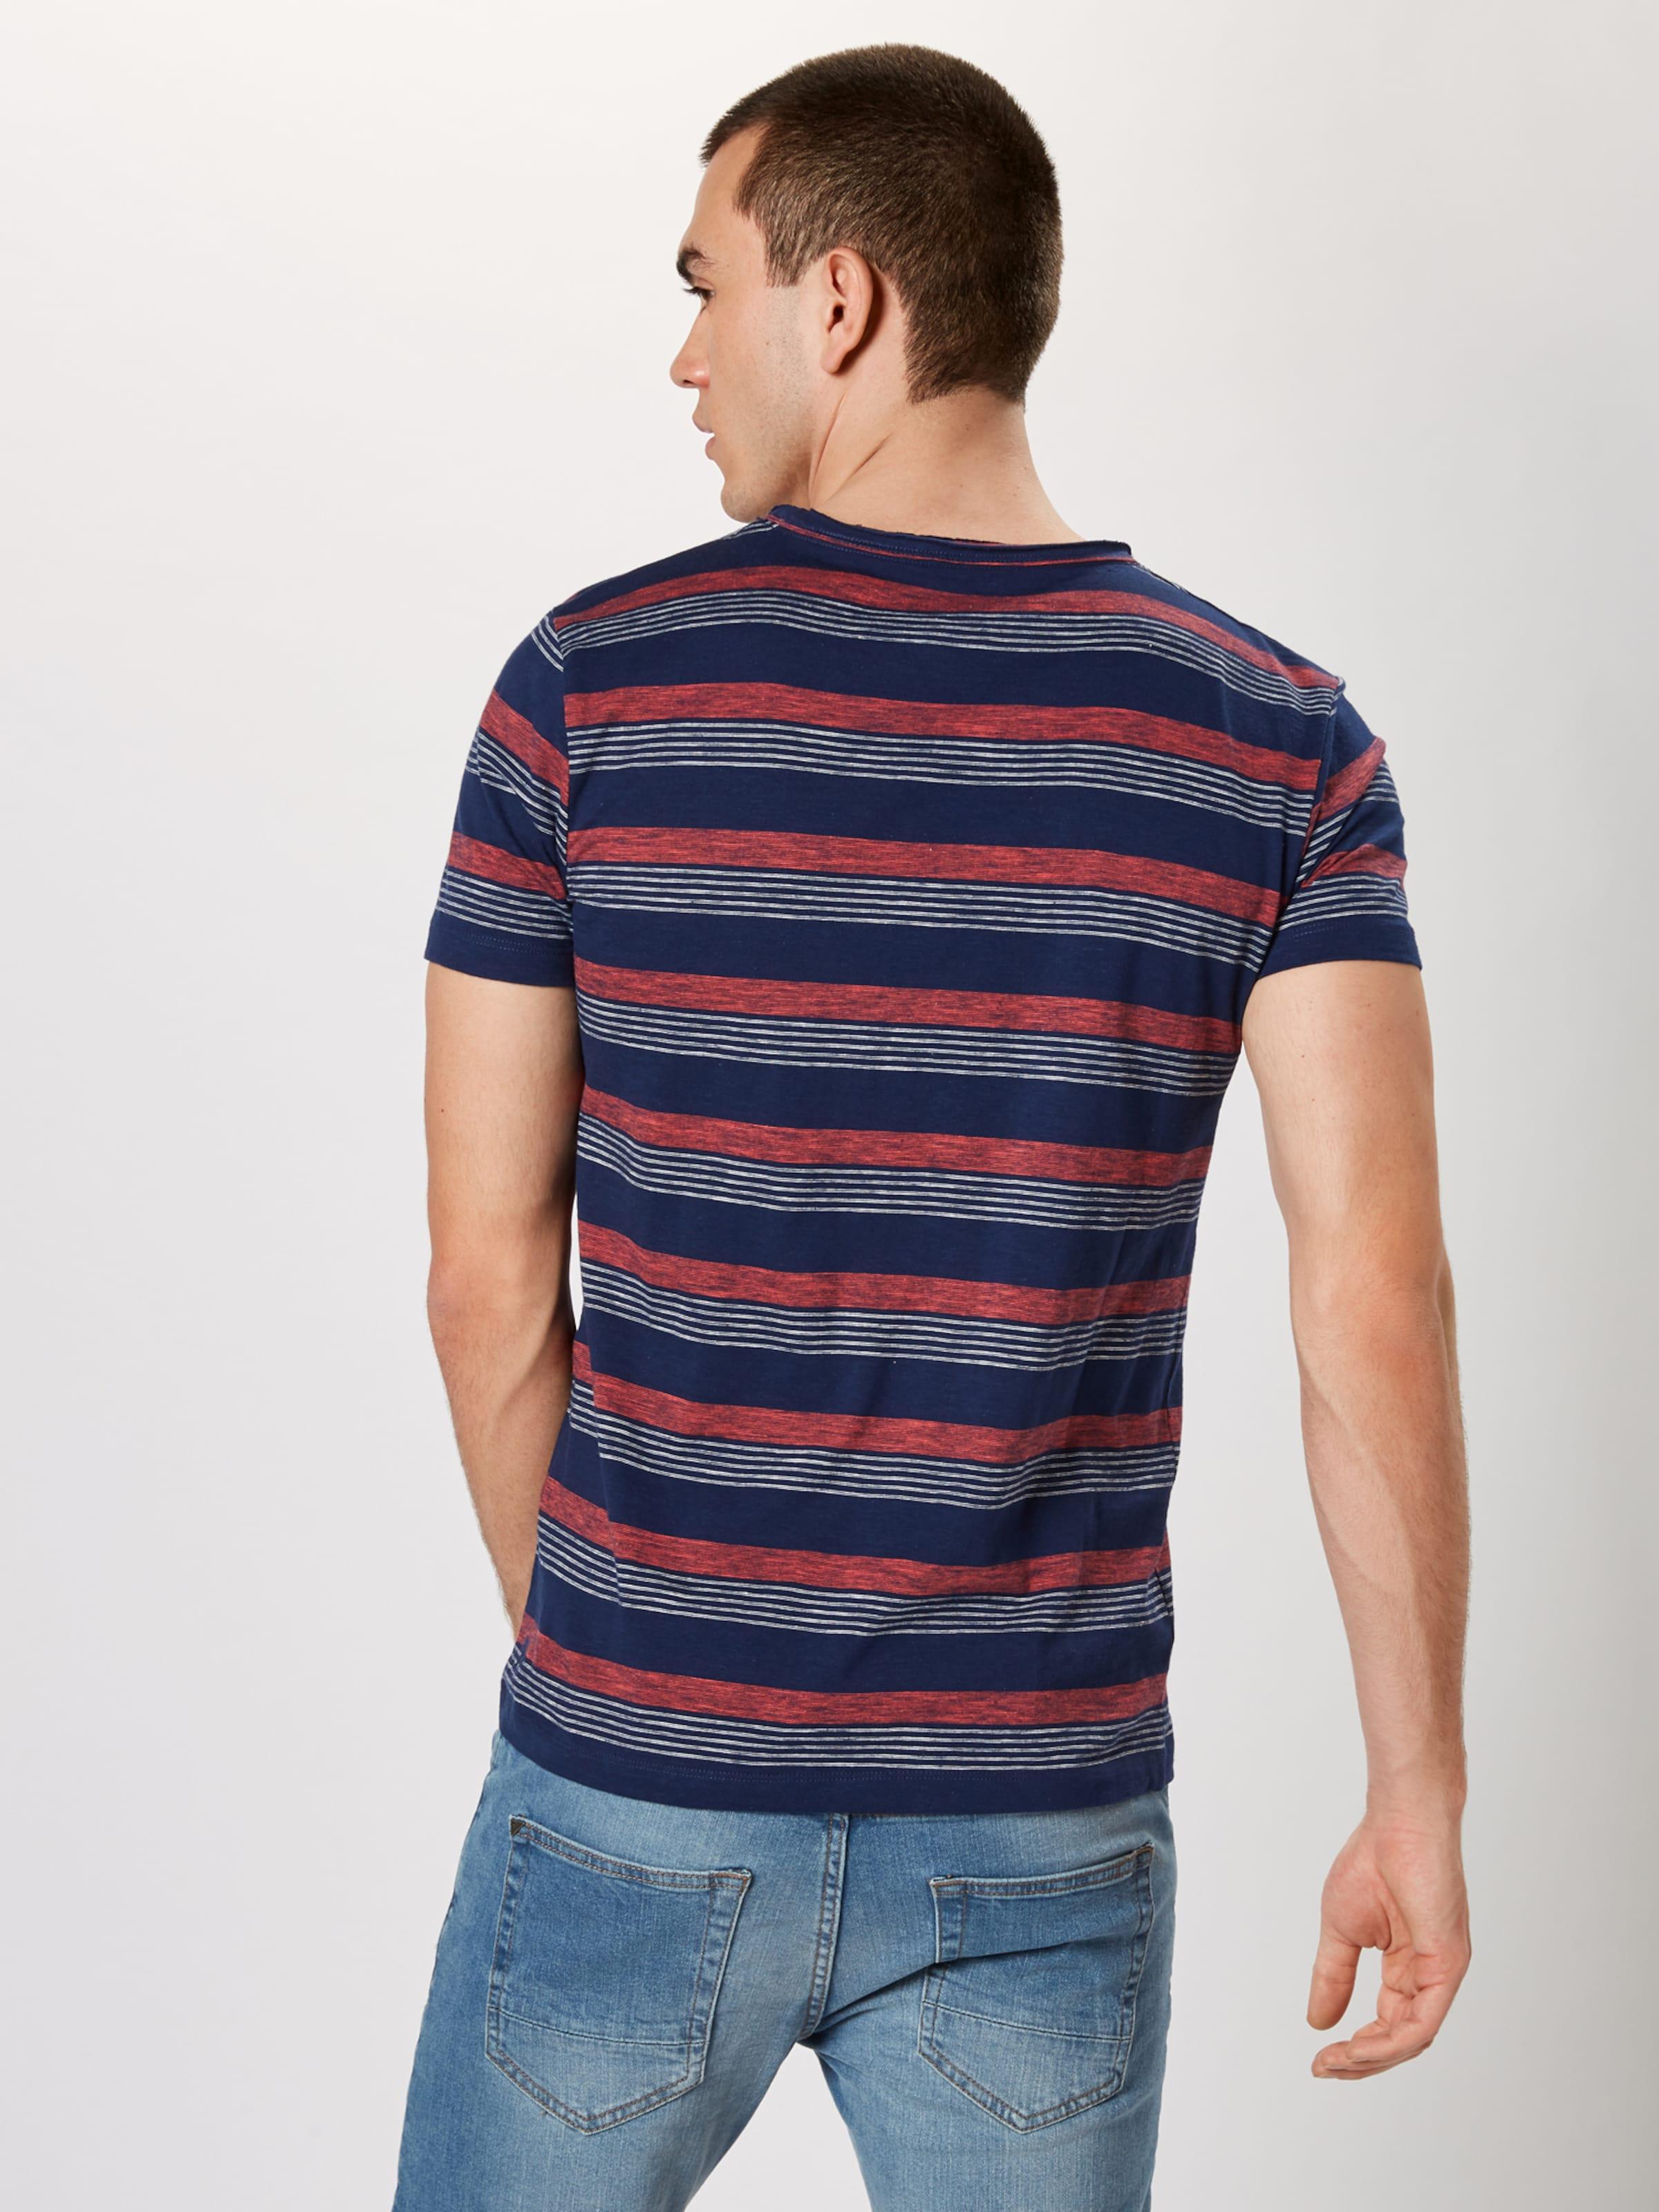 Tom T Clair En shirt Bleu MarineRouge Denim Tailor 76fygb